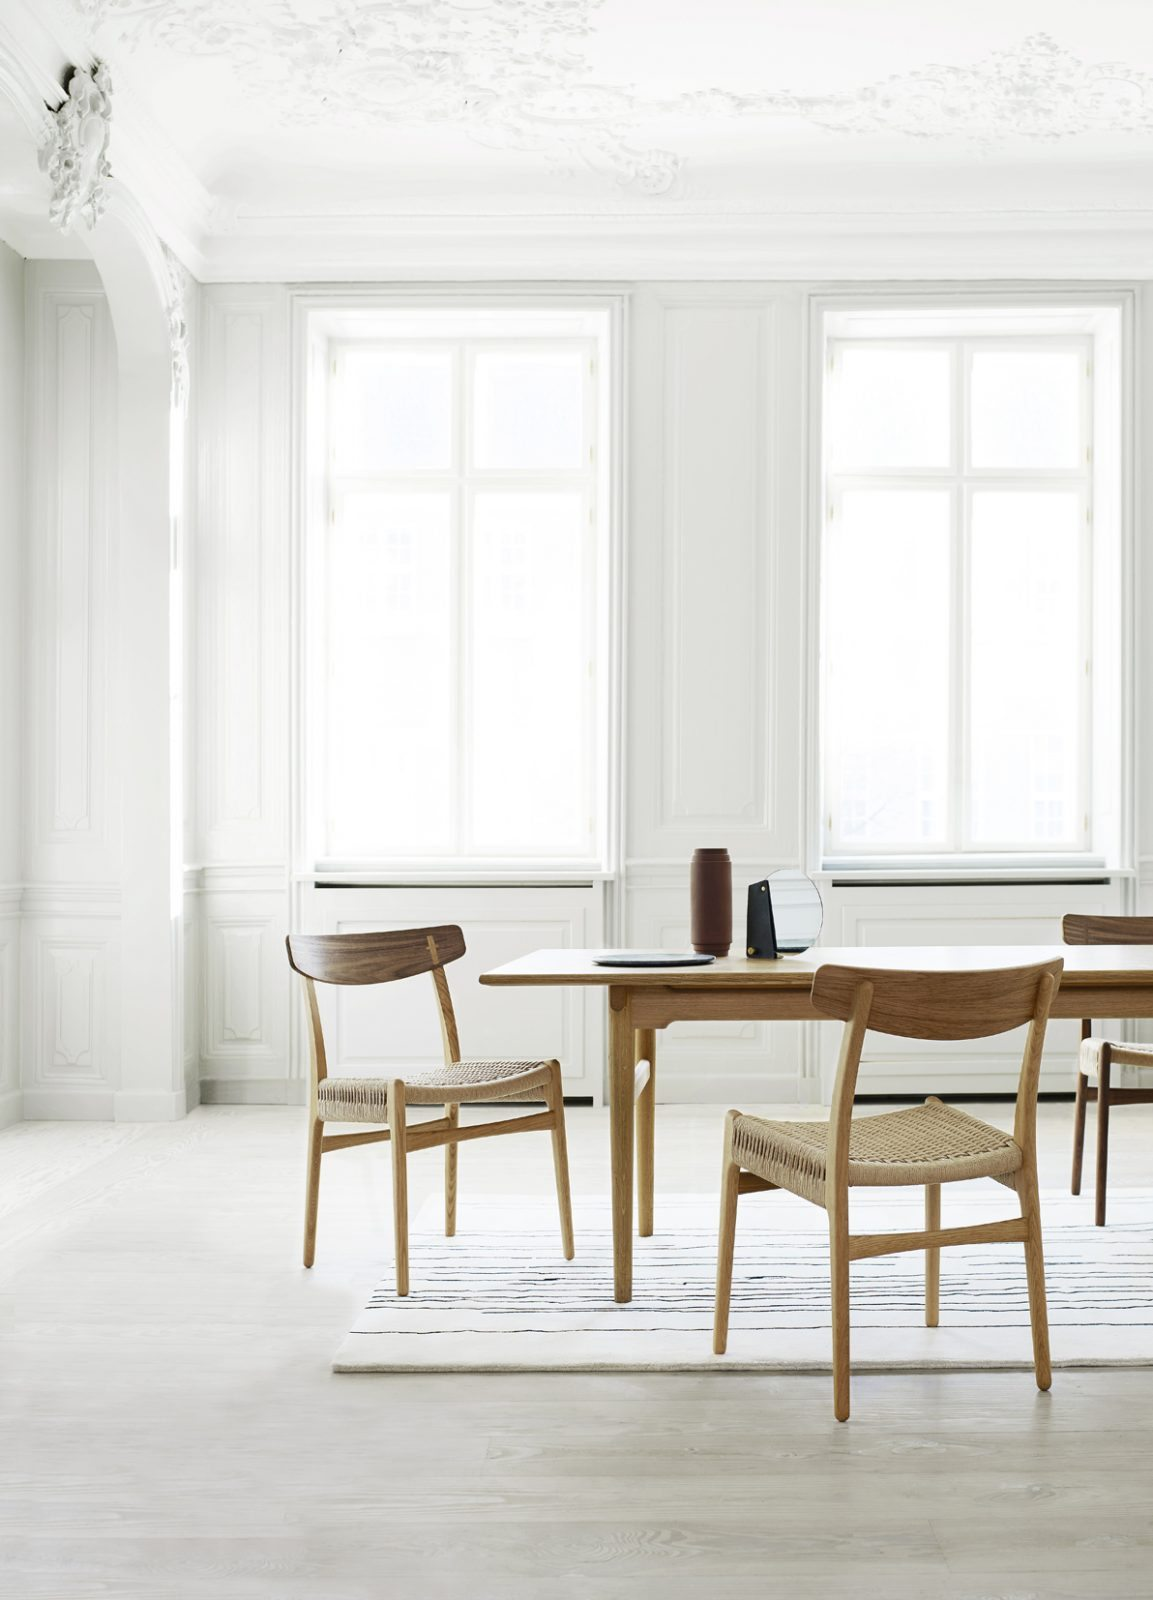 carl hansen ch23 stuhl nordic urban berlin germany. Black Bedroom Furniture Sets. Home Design Ideas